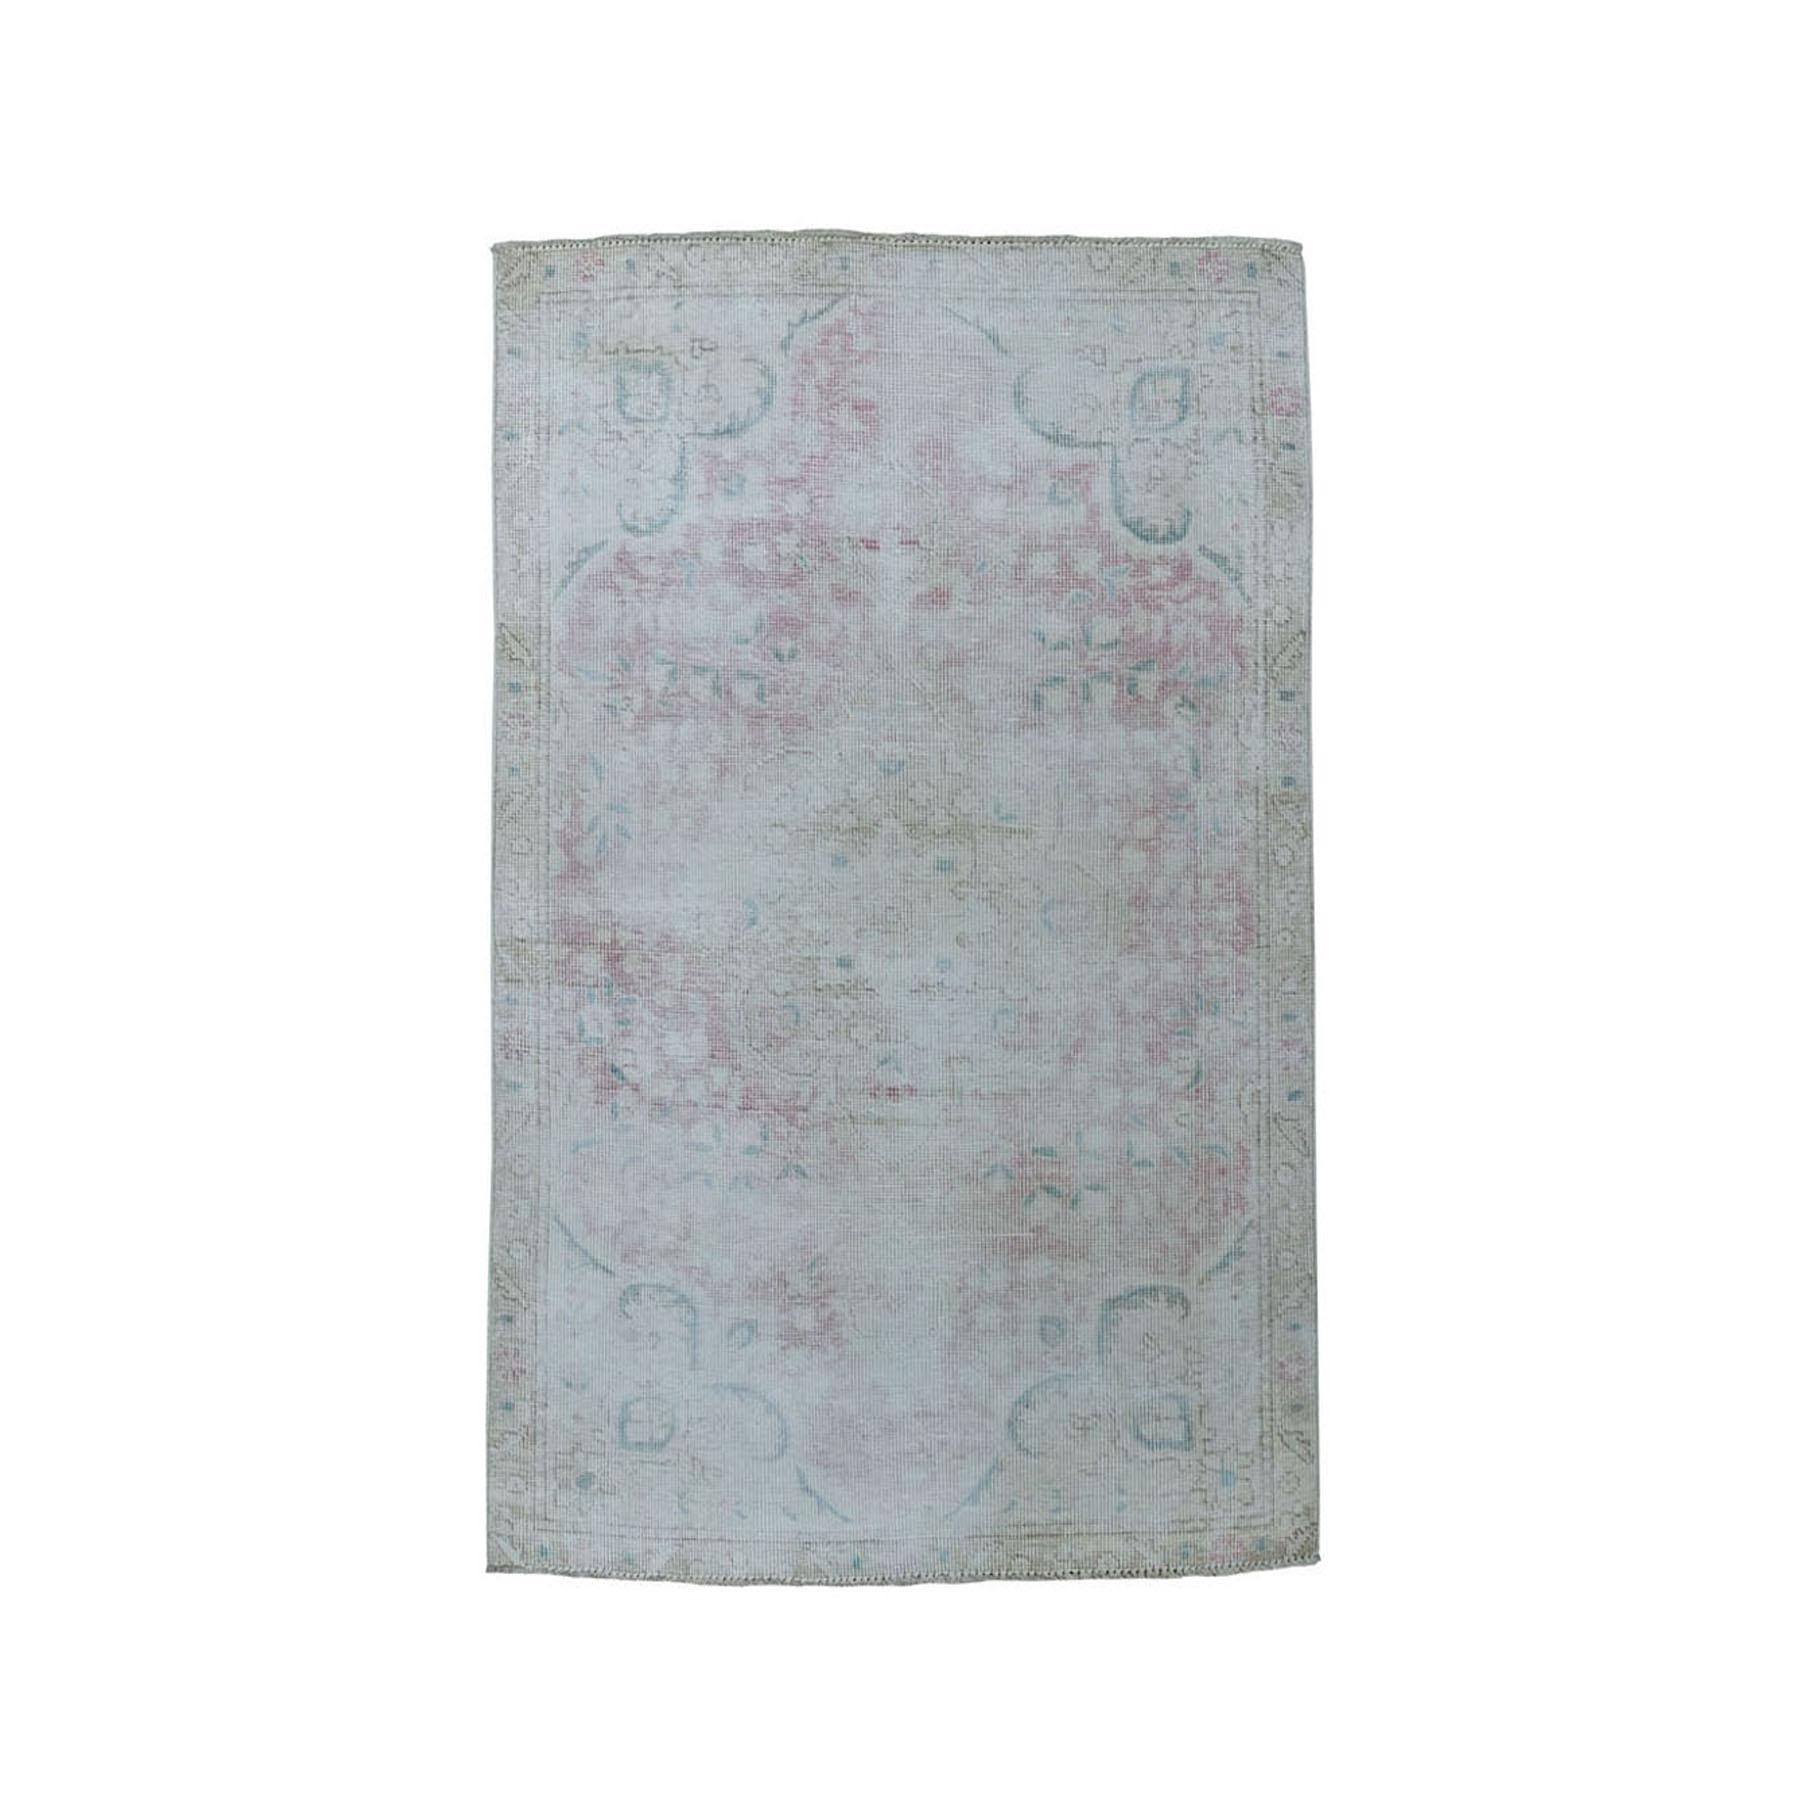 "3'X4'5"" Vintage White Wash Tabriz Worn Wool Hand-Knotted Oriental Rug moae07a7"